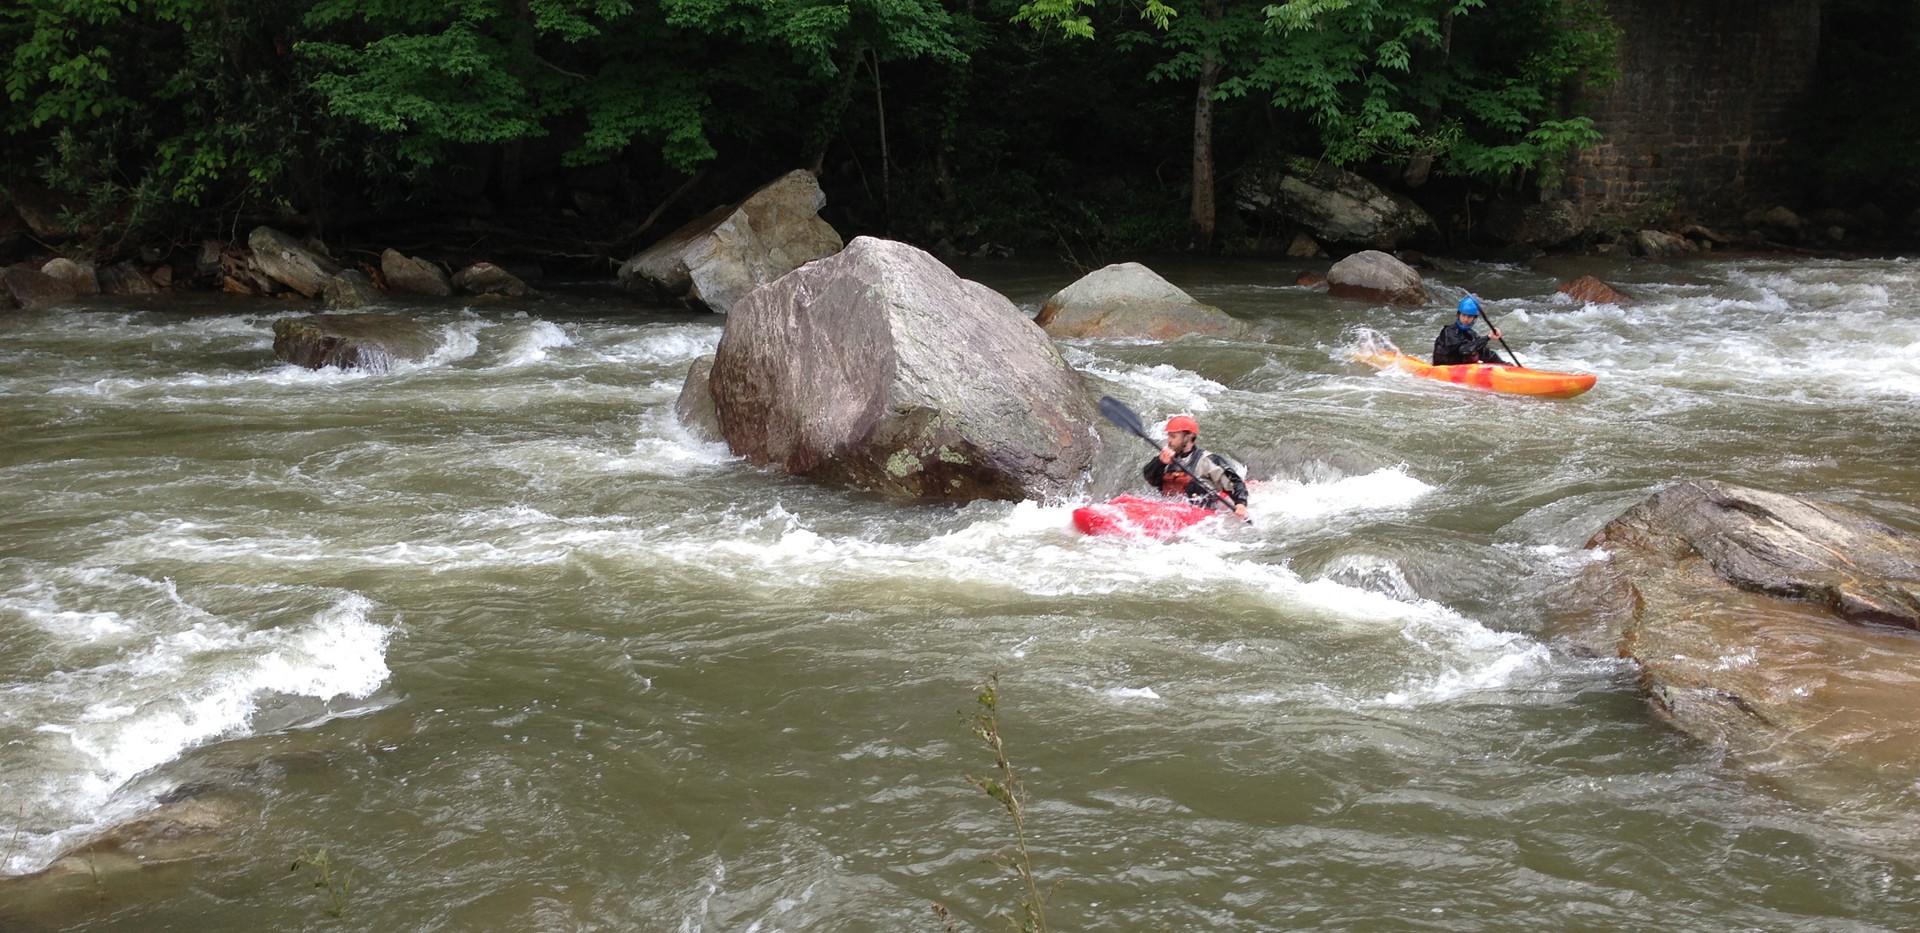 Kayaking the Rocky Broad River in Chimney Rock Village